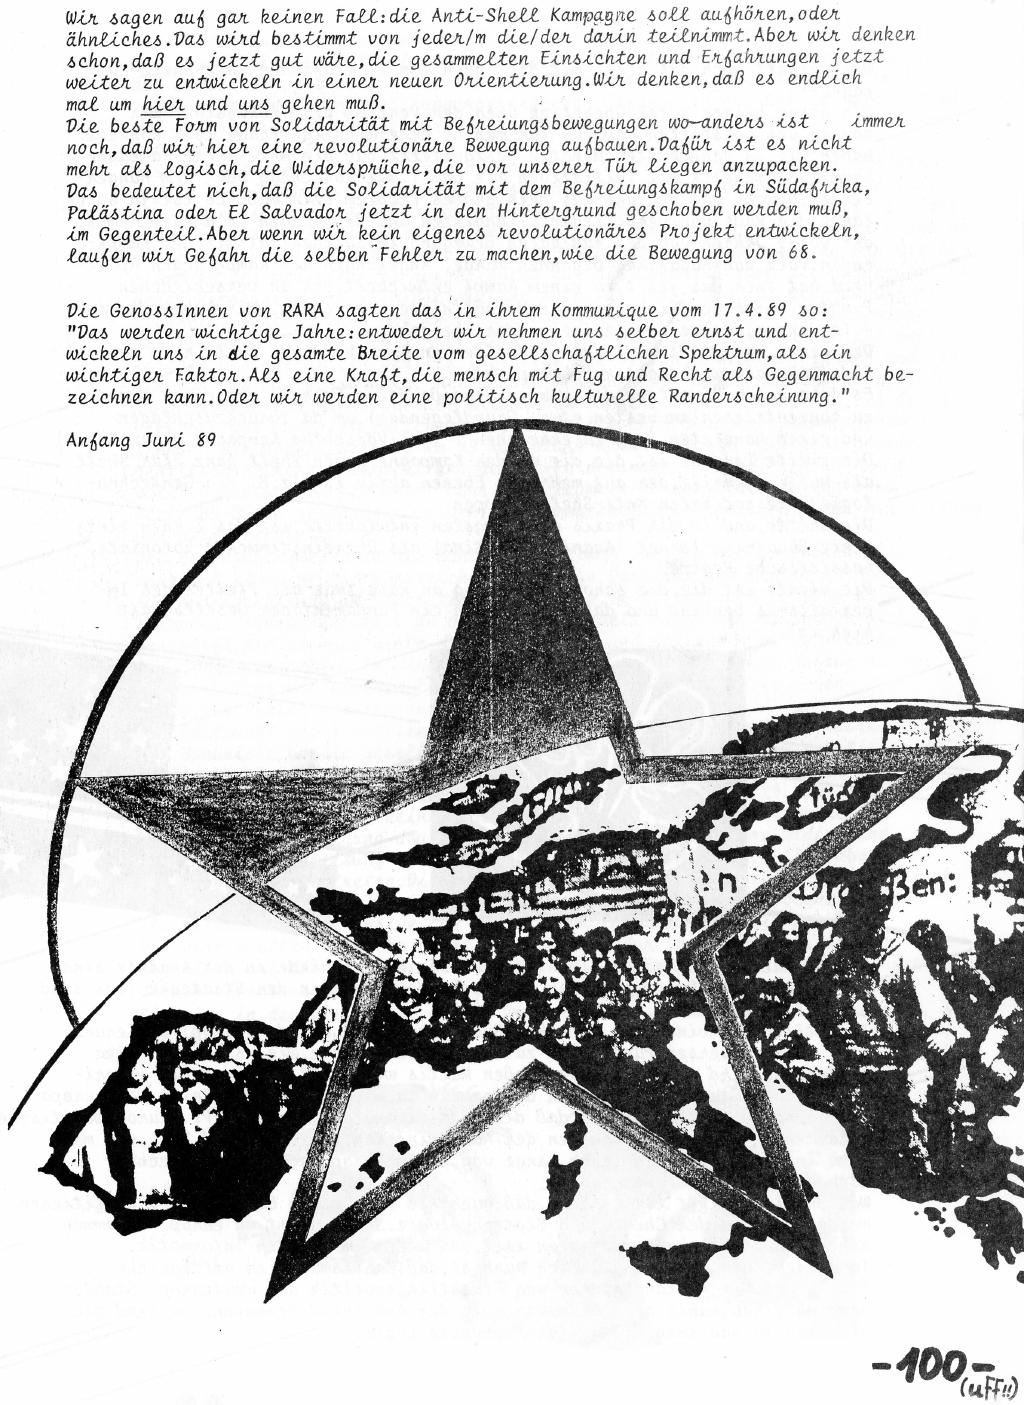 Belgien_Doku_Besetzung_EG_Kommission_1989_102